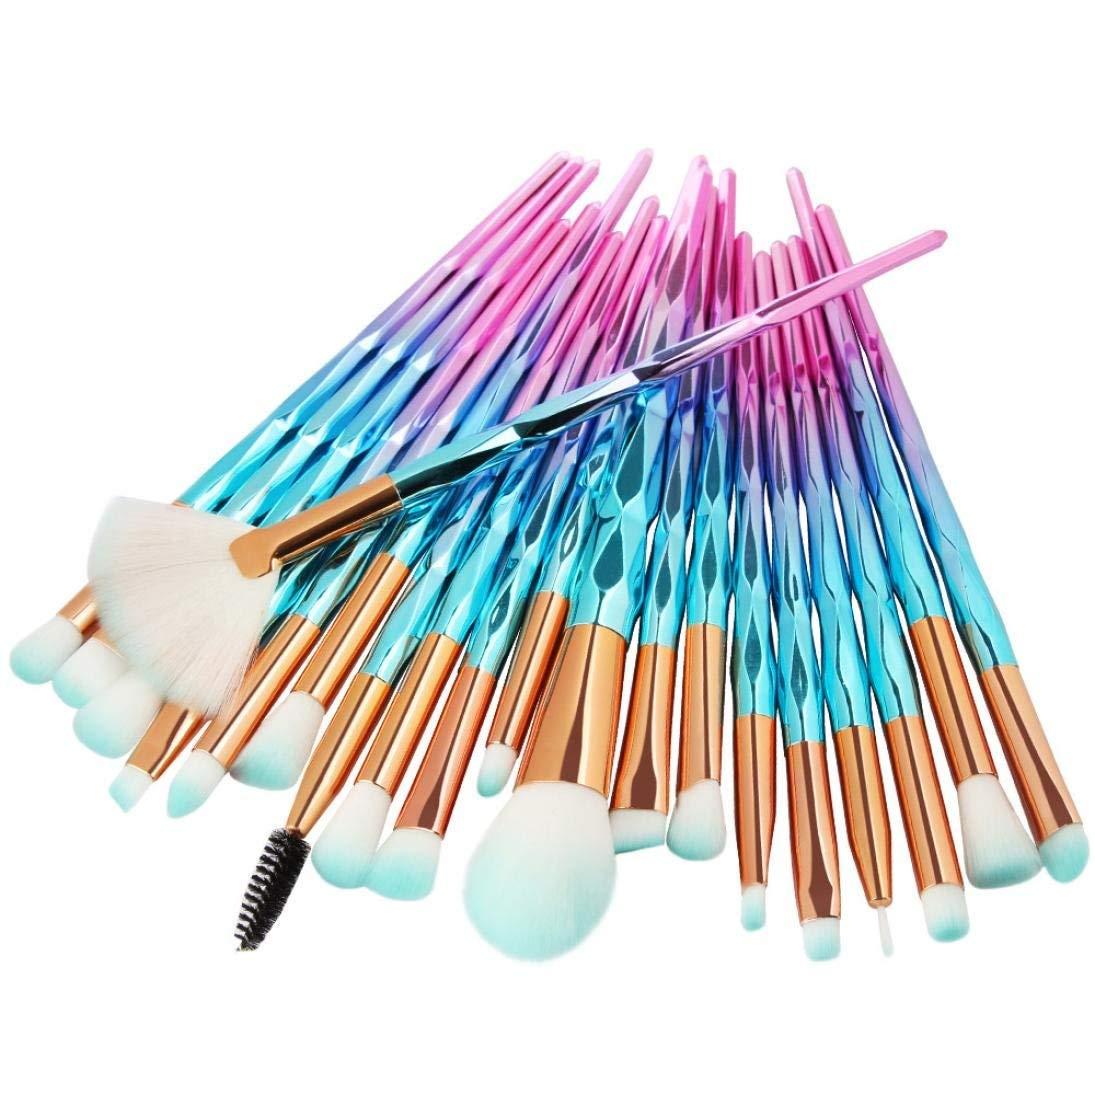 Eyeshadow Brushes,Makeup Brushes Set Professional,Posional 2018 | Professional Makeup Brush Set | Cosmetic Make Up Brushes | Foundation Brushes |Face Makeup Brushes|Concealer (Gradient Blue)